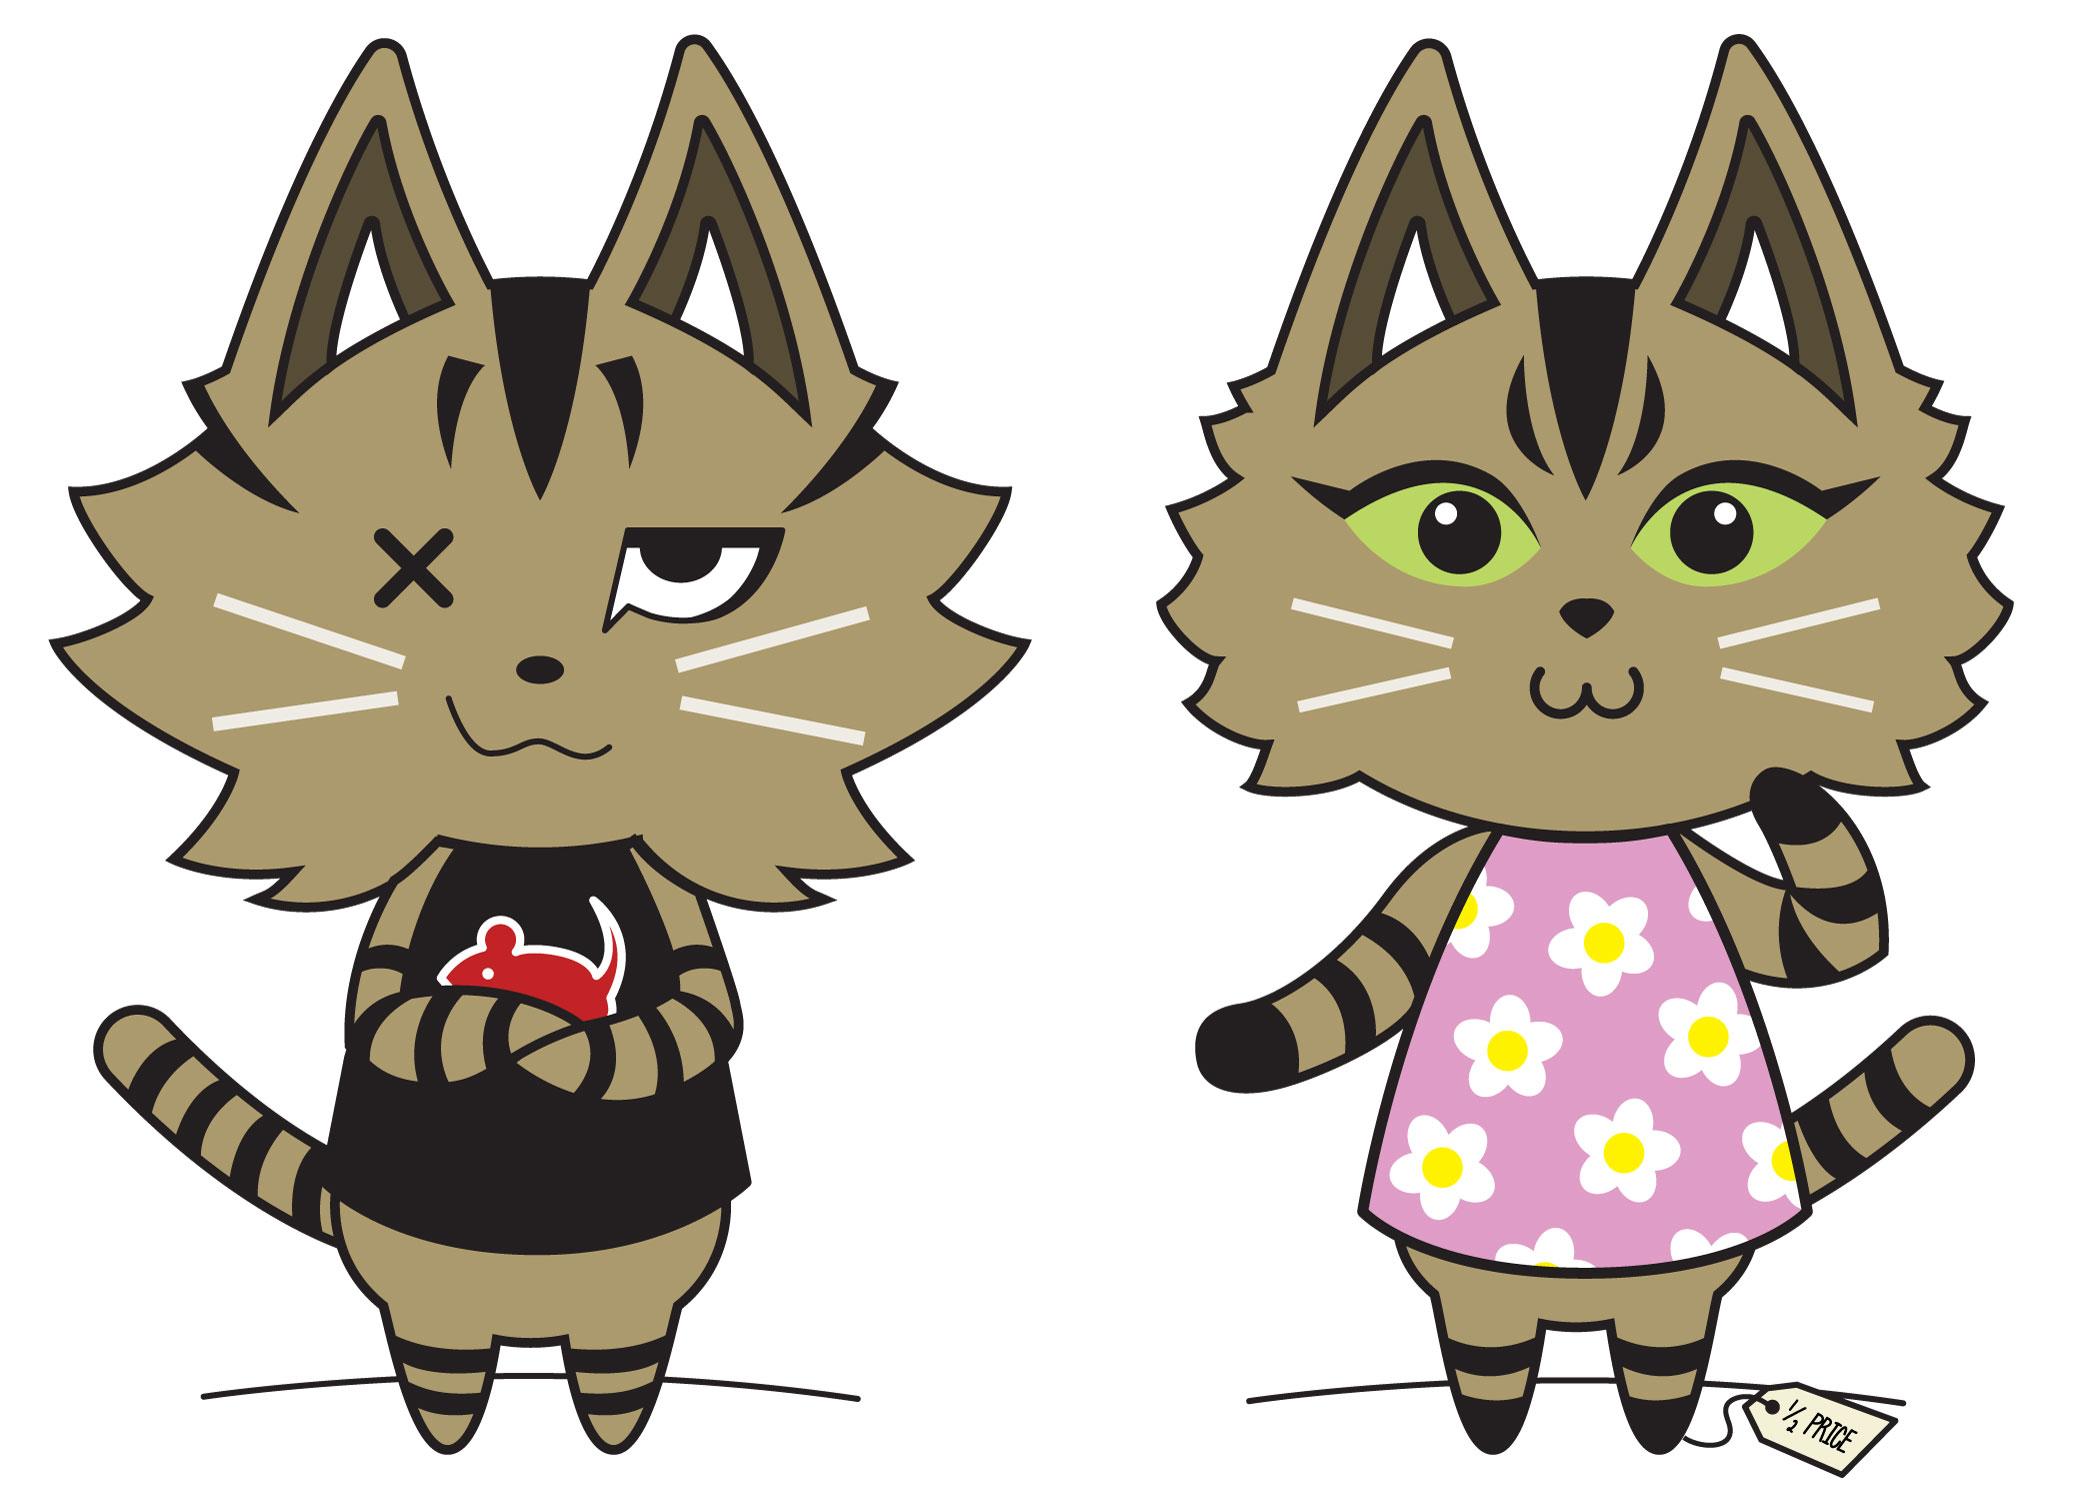 Will & Ava, Animal Crossing Style, 2015